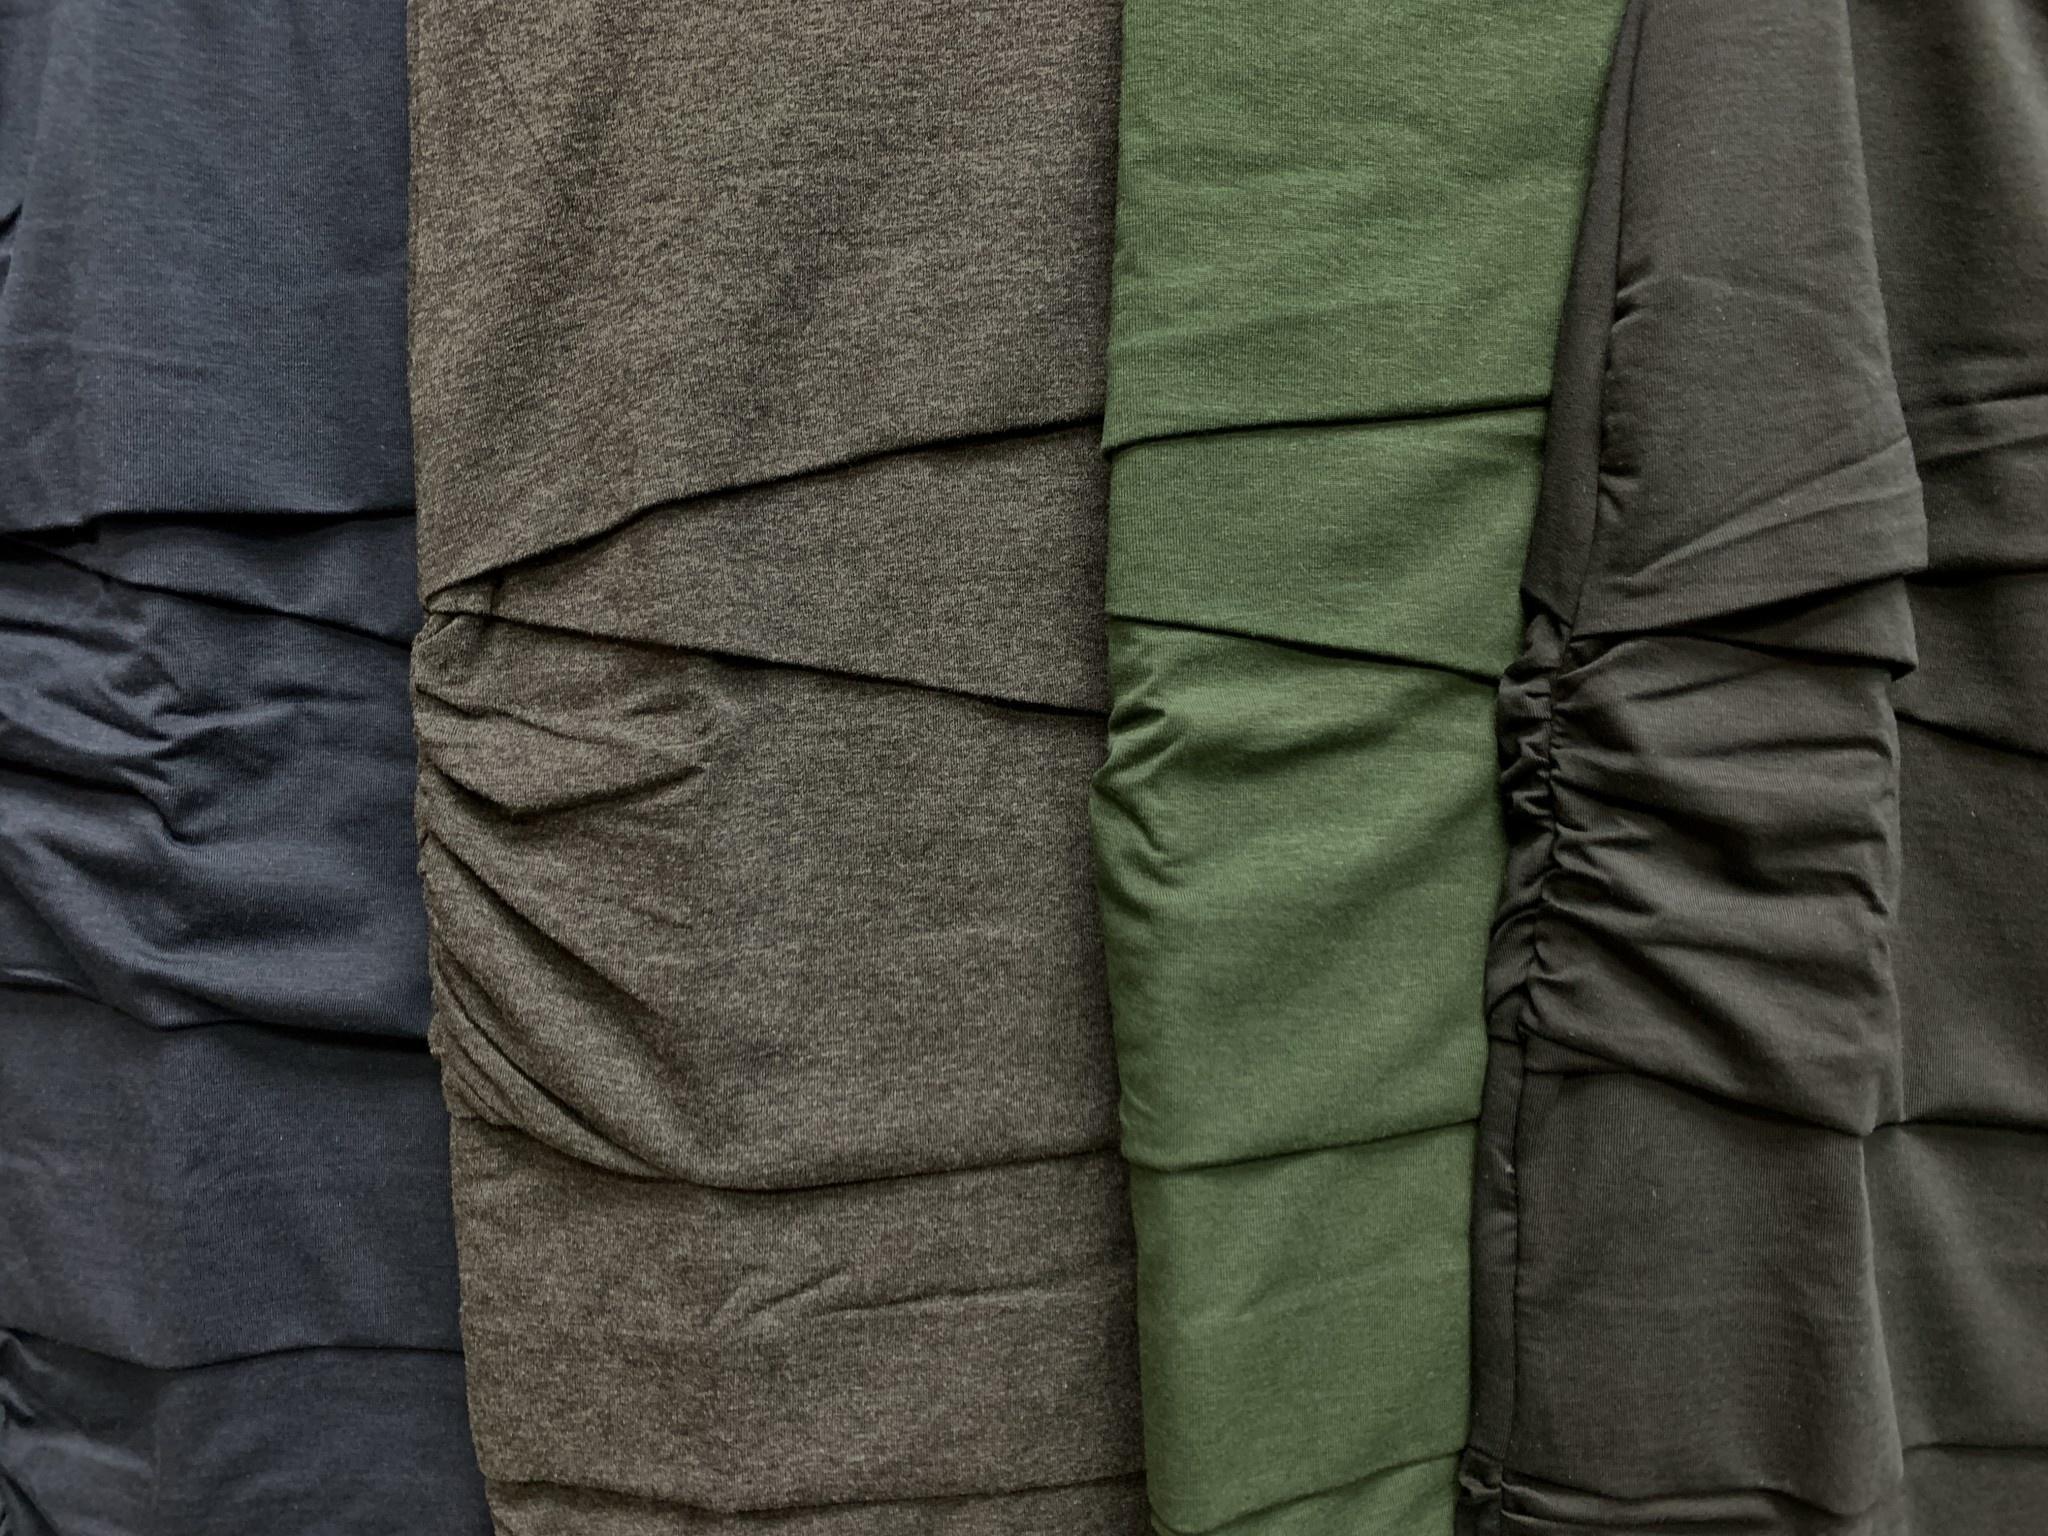 Jersey Layered Skirt - Shorter Length